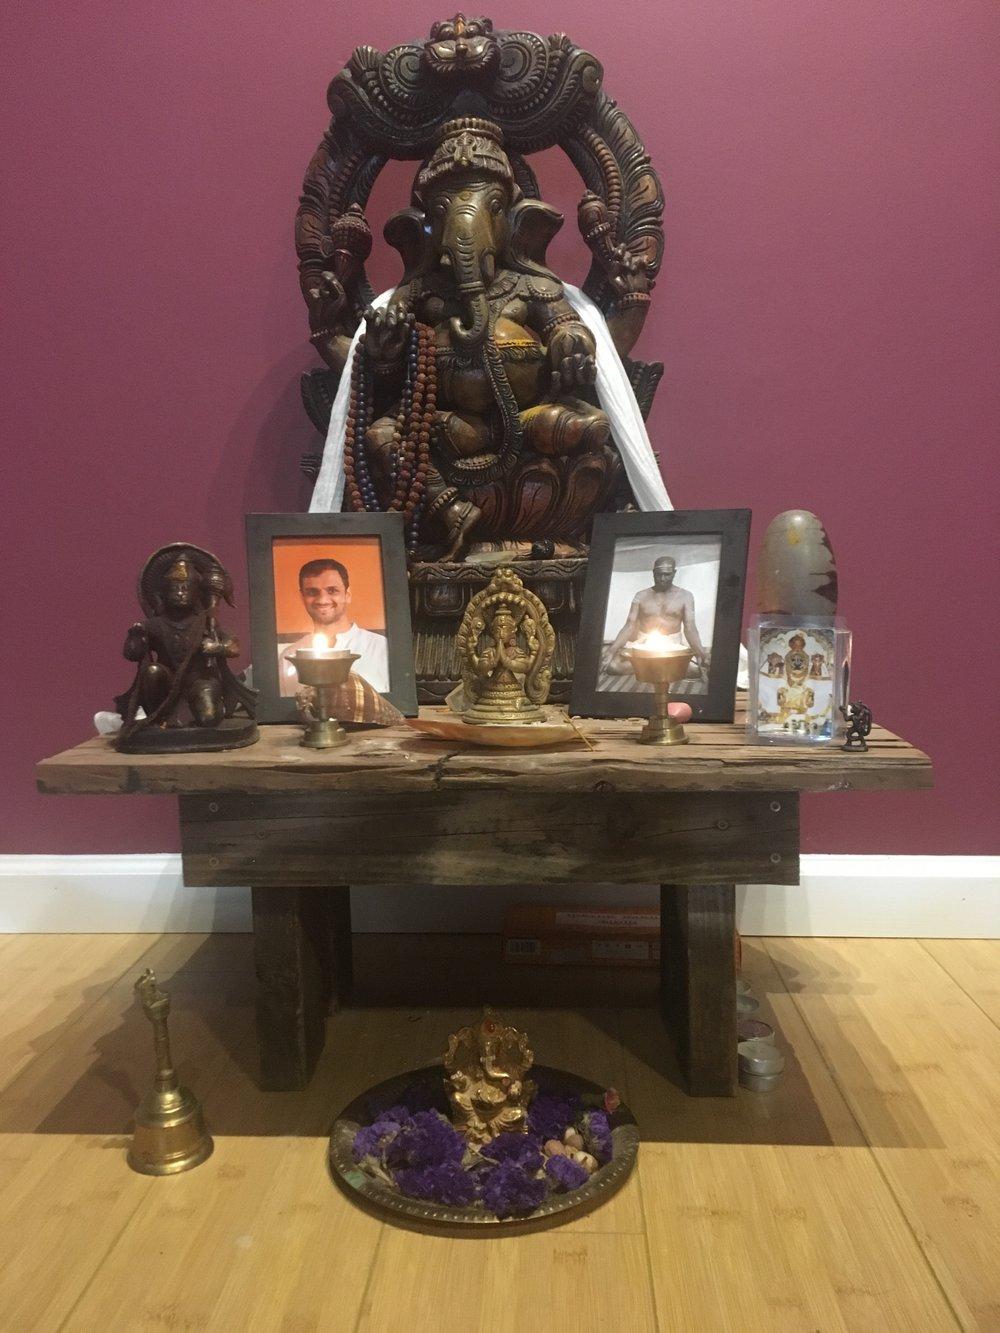 The altar at Ashtanga Yoga Worldwide